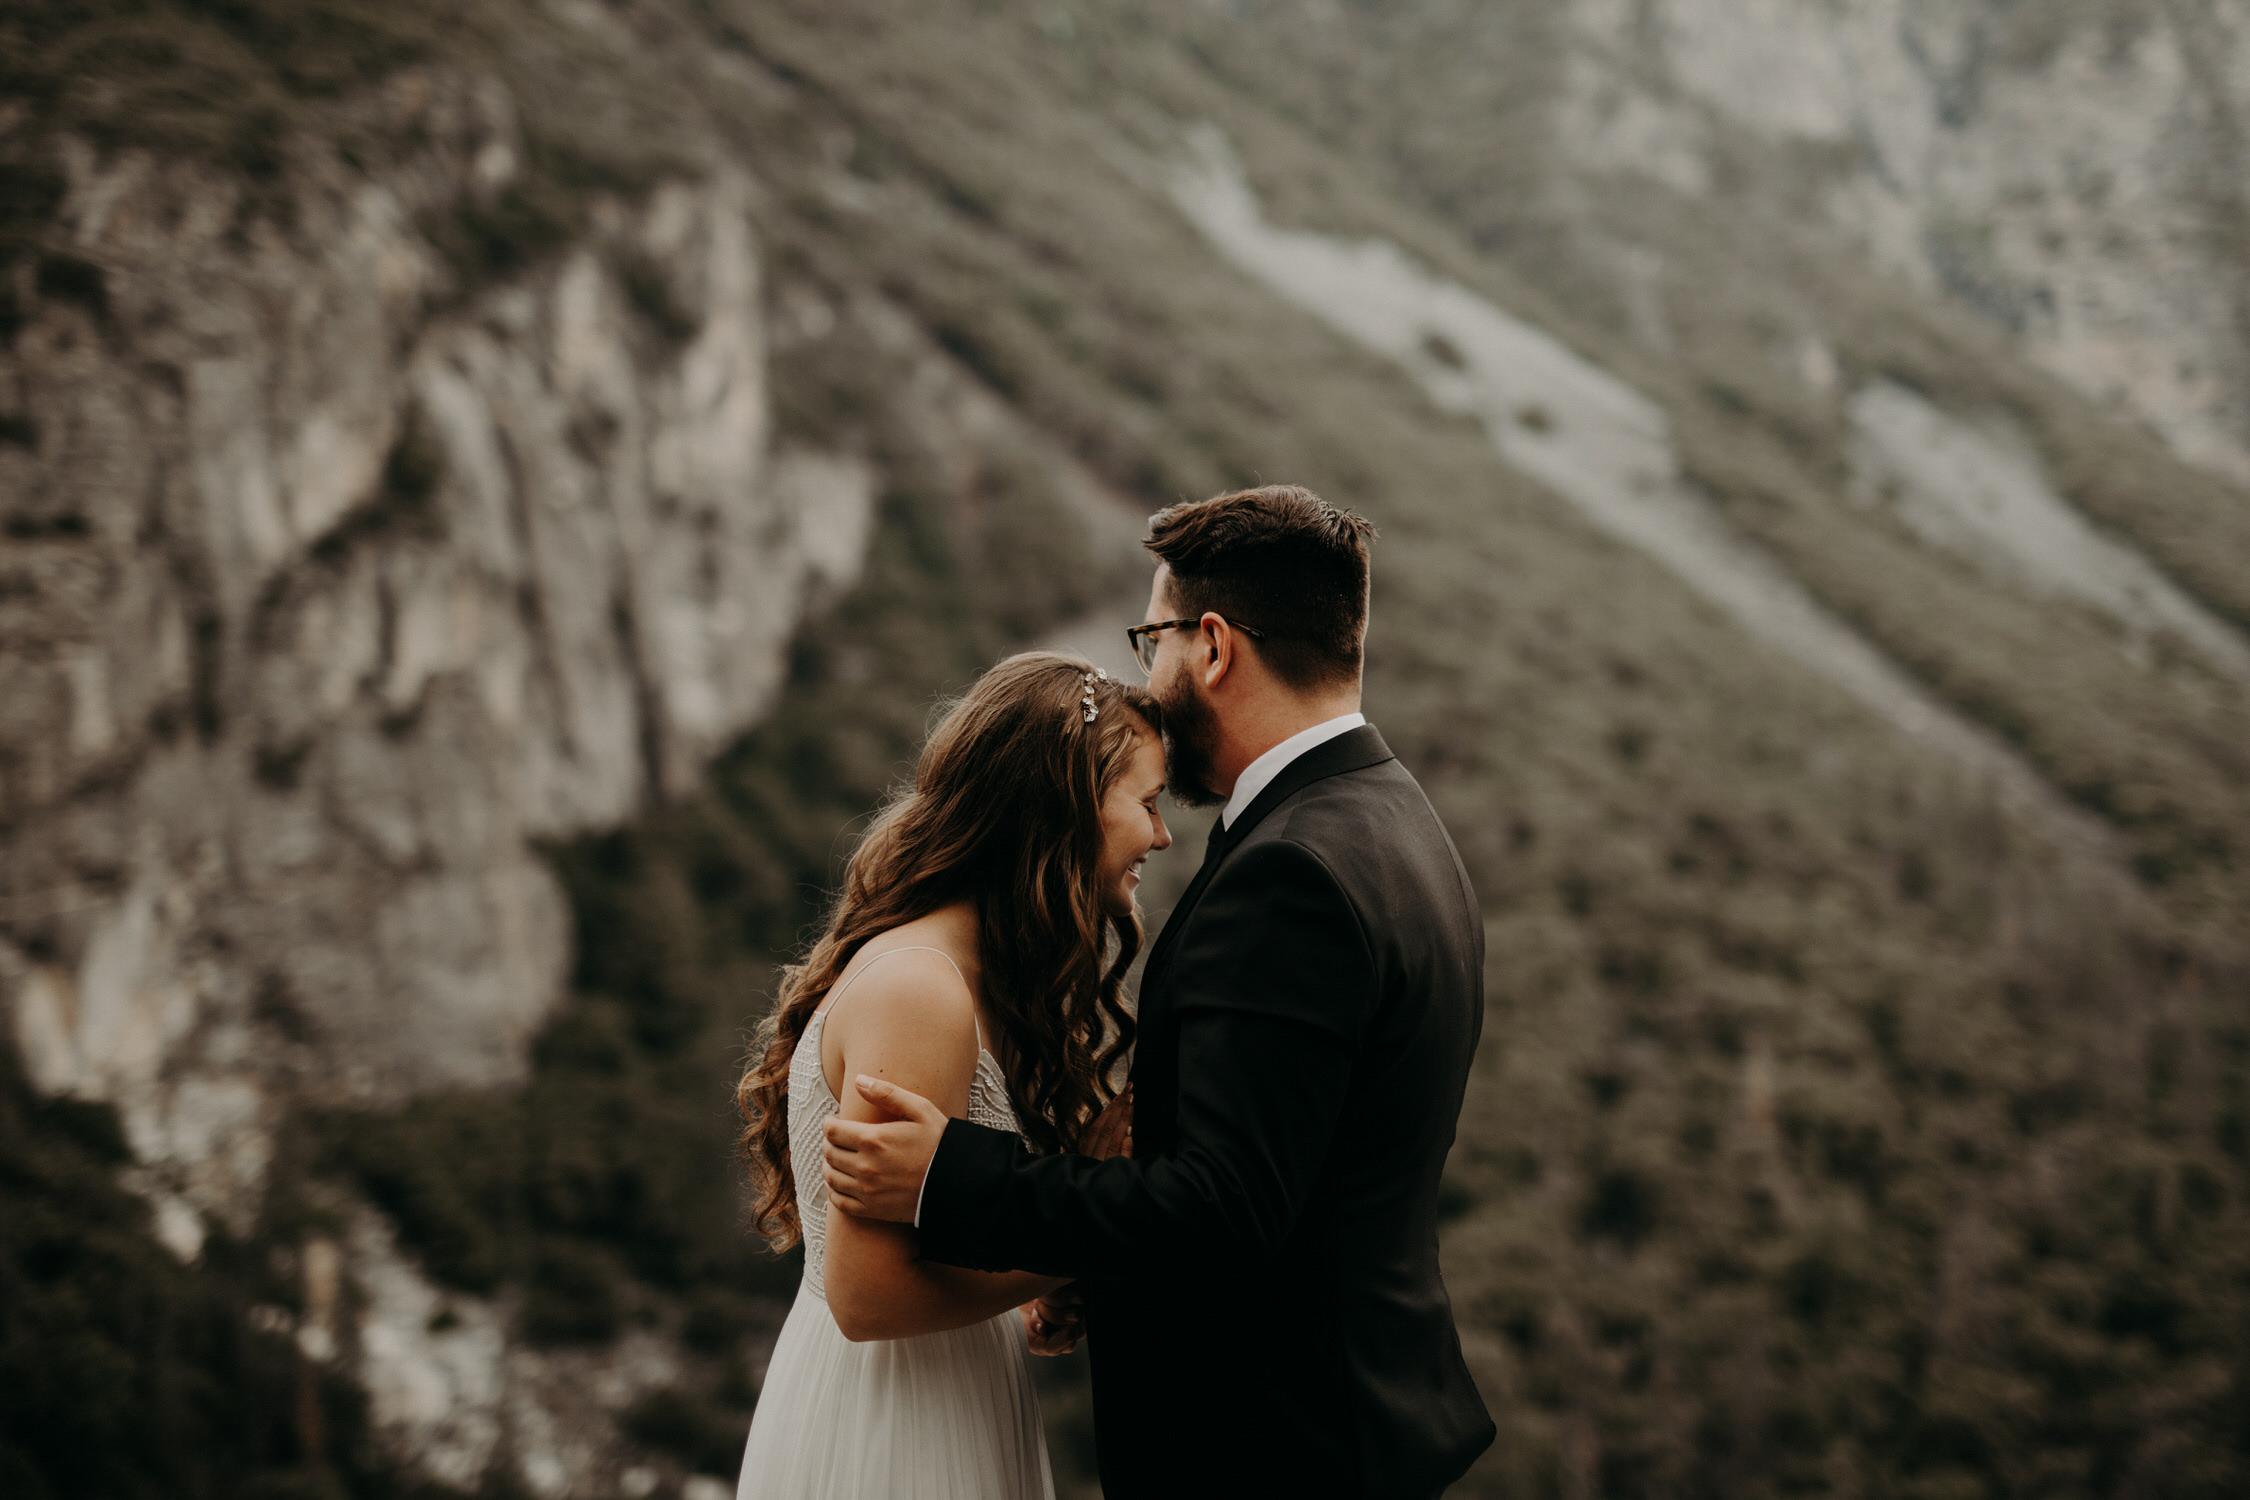 intimate-couple-elopement-yosemite-35.jpg